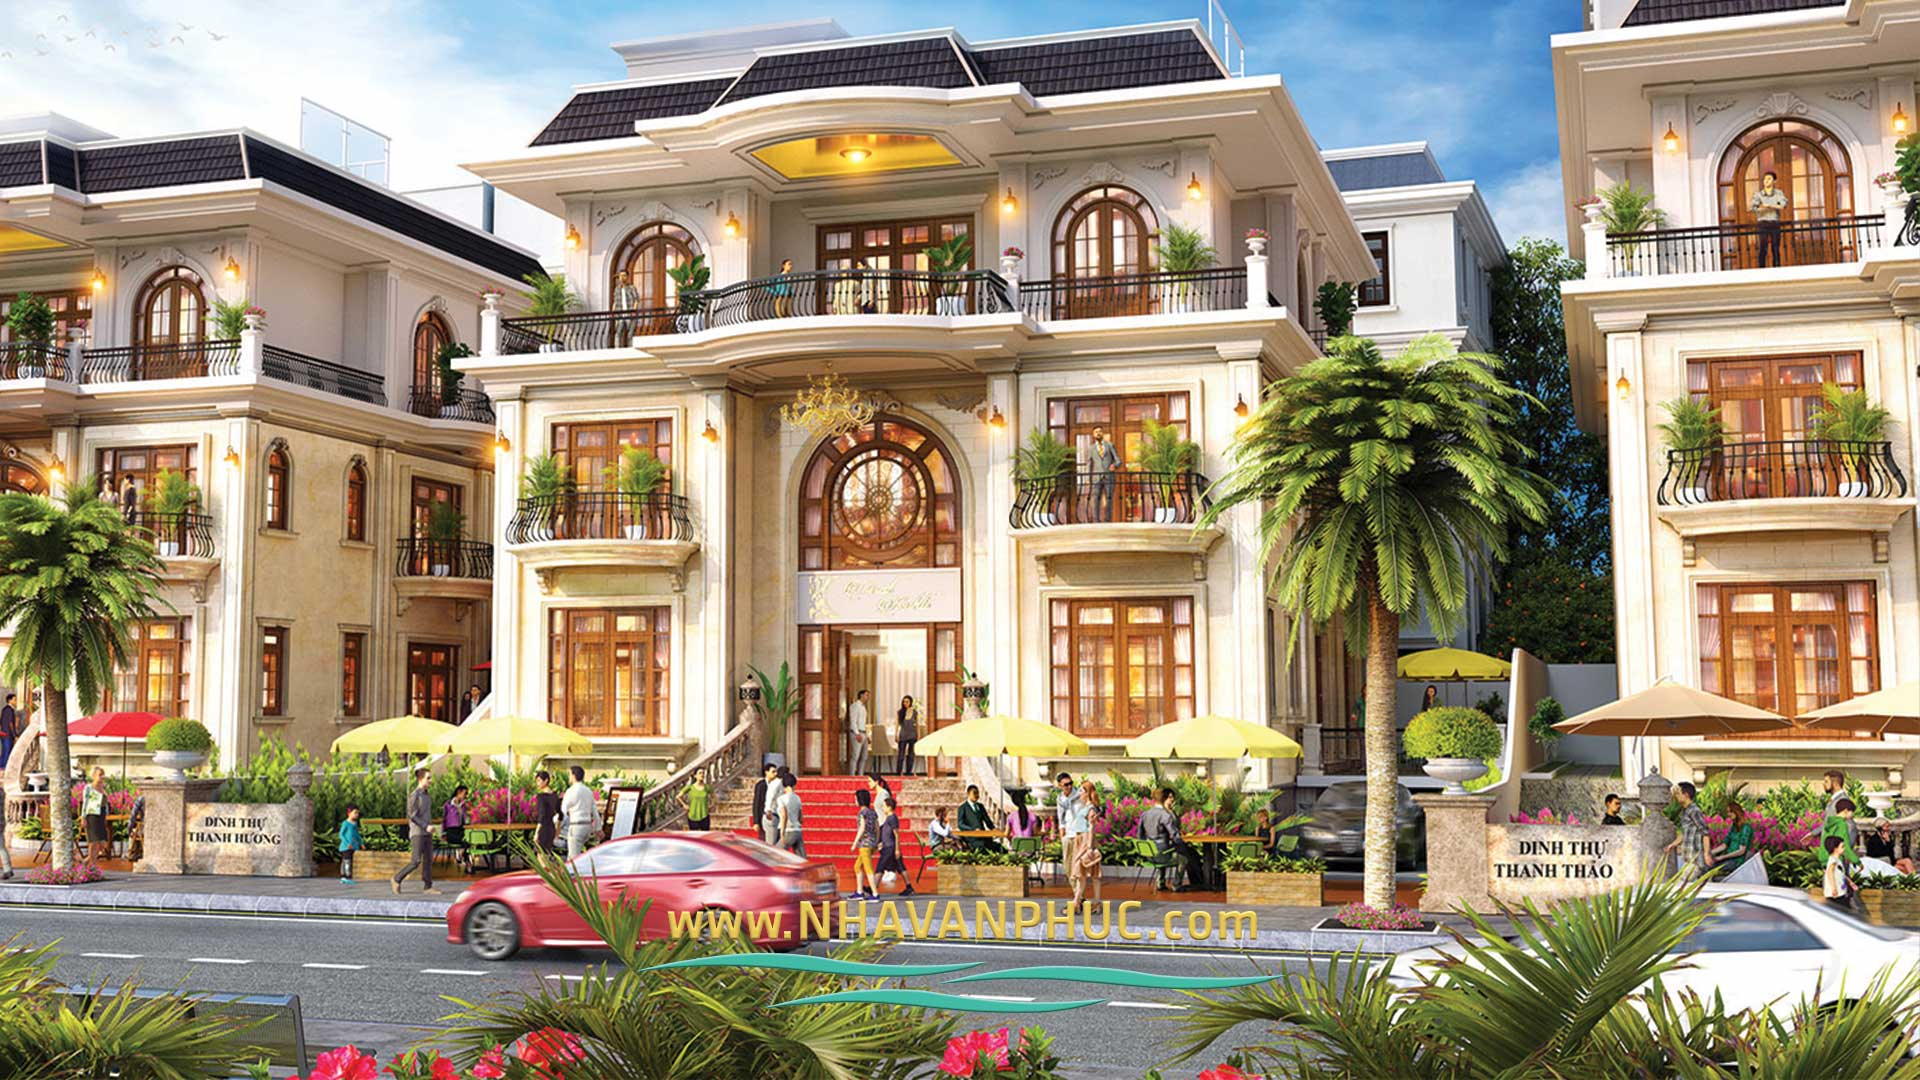 Mau biet thu Mansion du an khu do thi Van phuc city